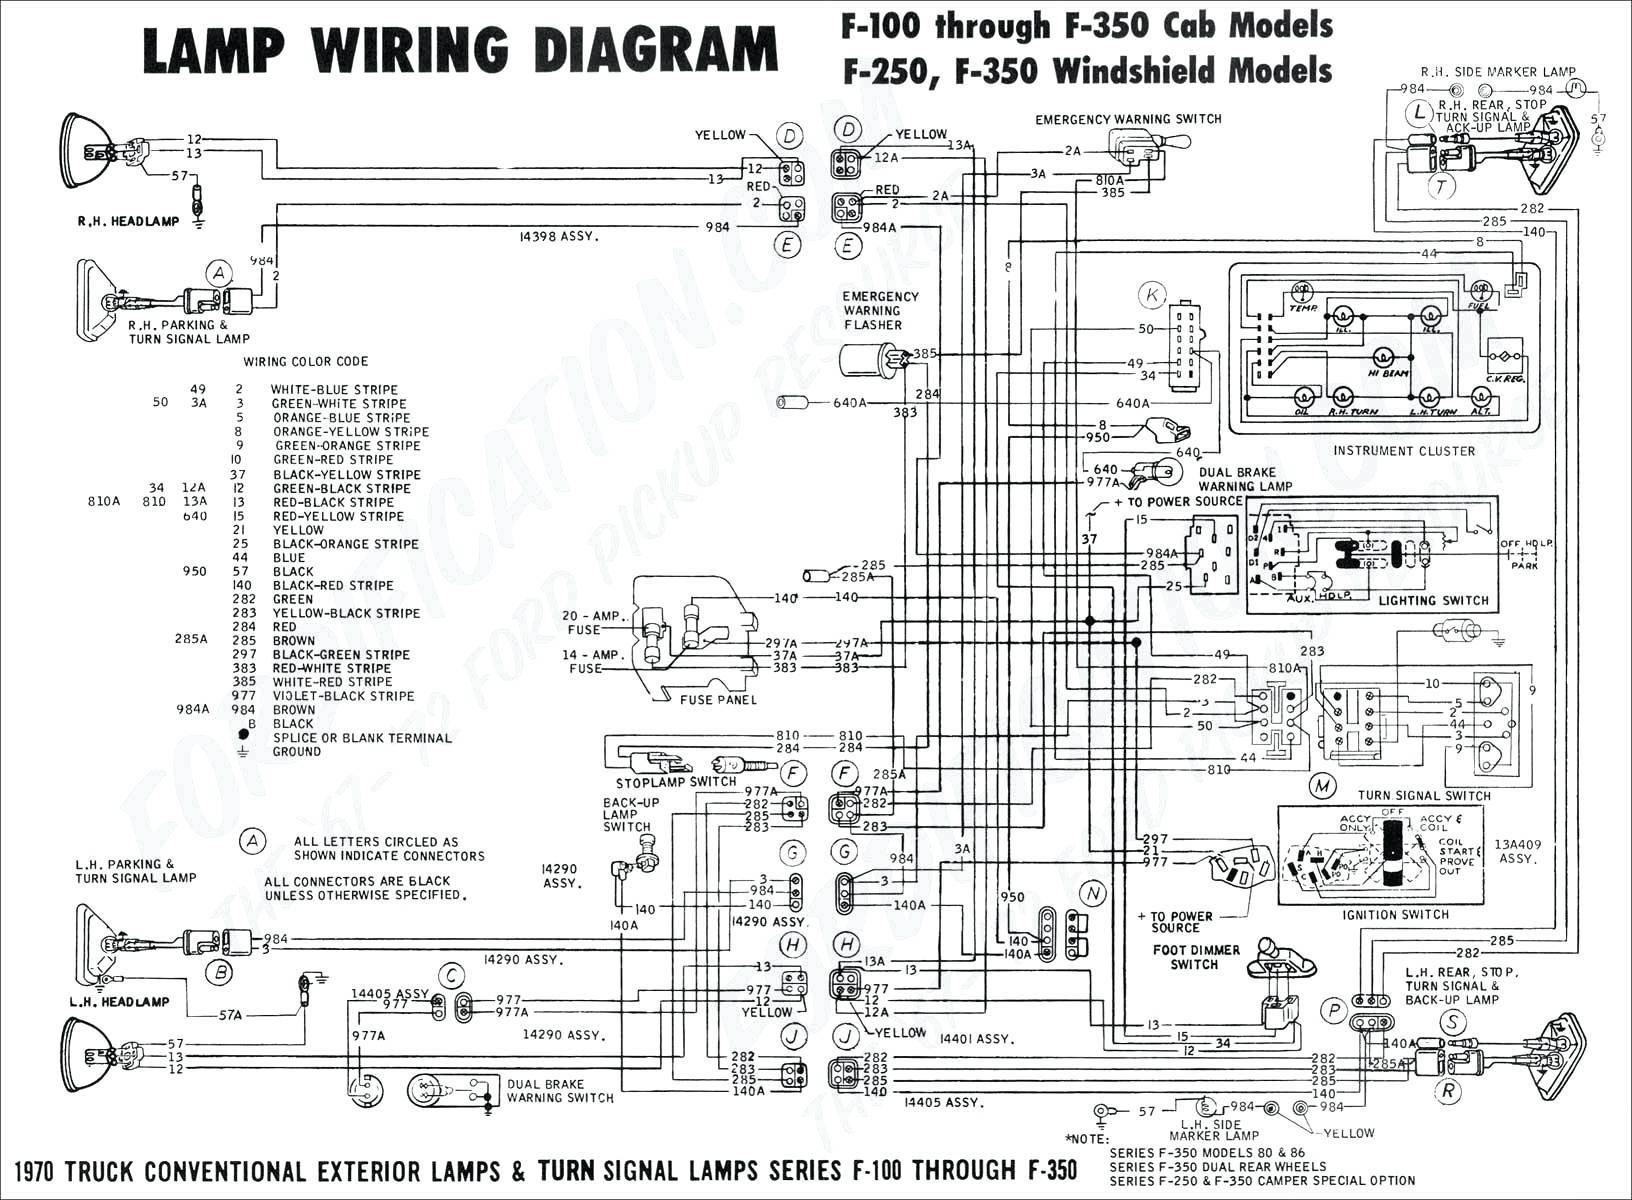 toyota wiring diagrams archives binatanicom